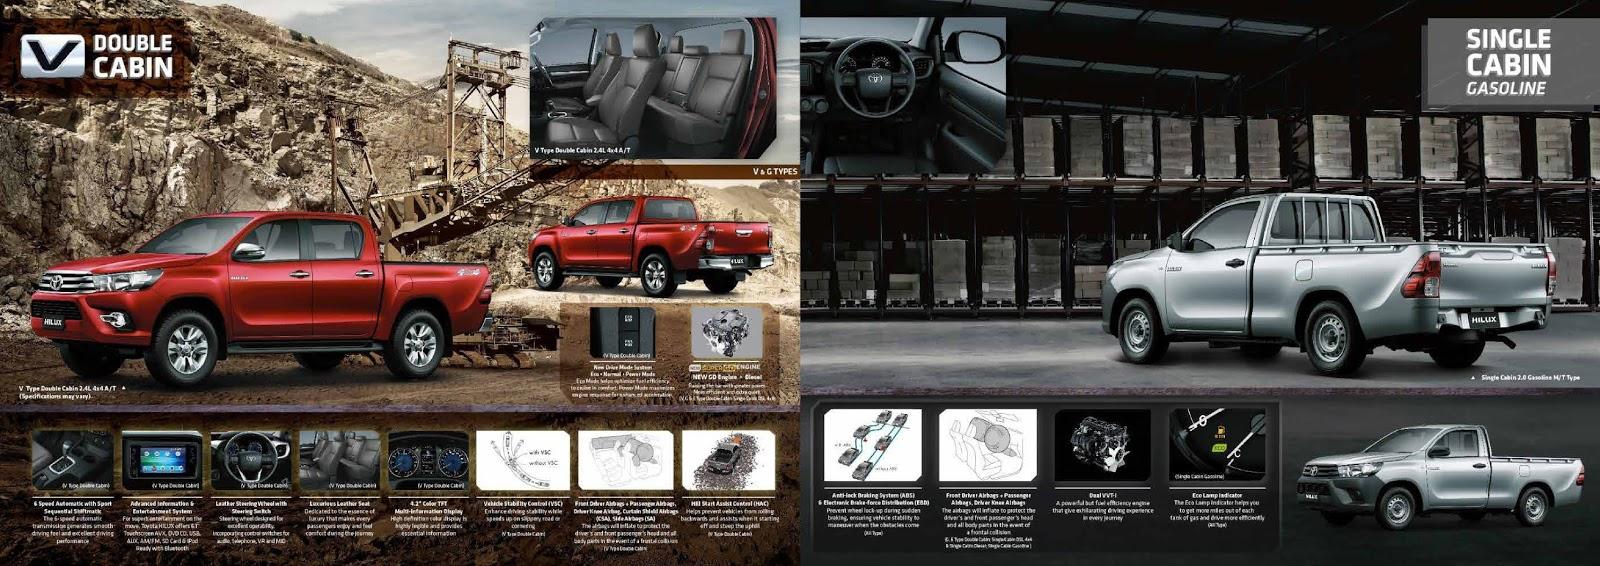 New Hilux DC - Info Promo & Harga Toyota Hilux DC Bali 2020